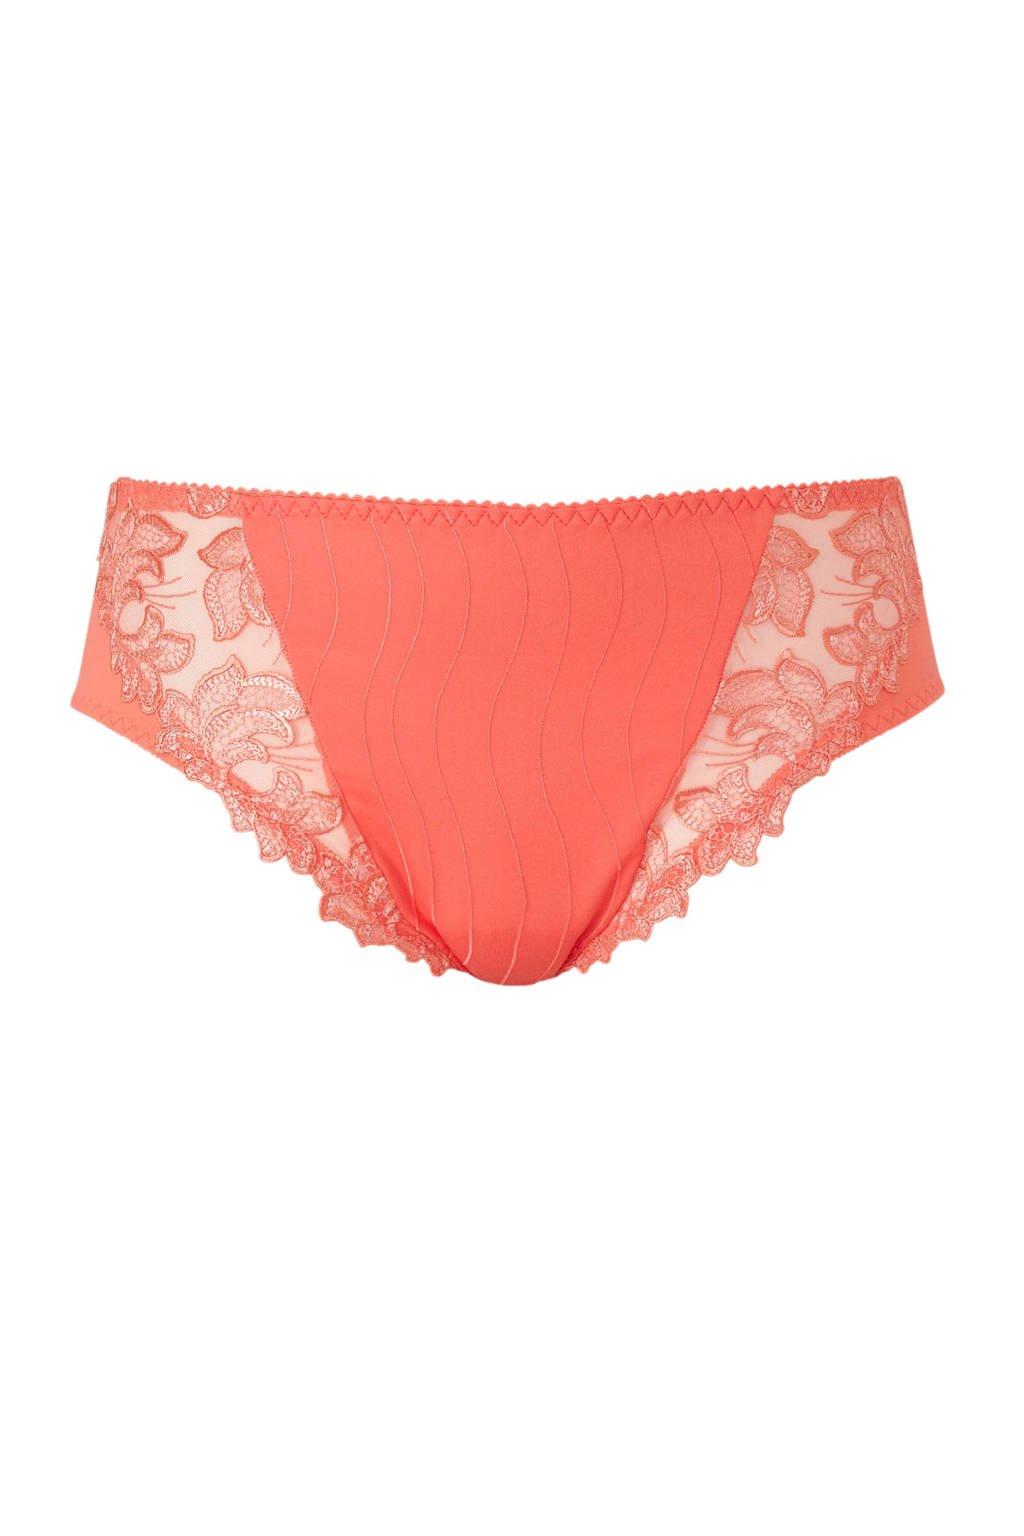 PrimaDonna slip Deauville Taille roze, Roze